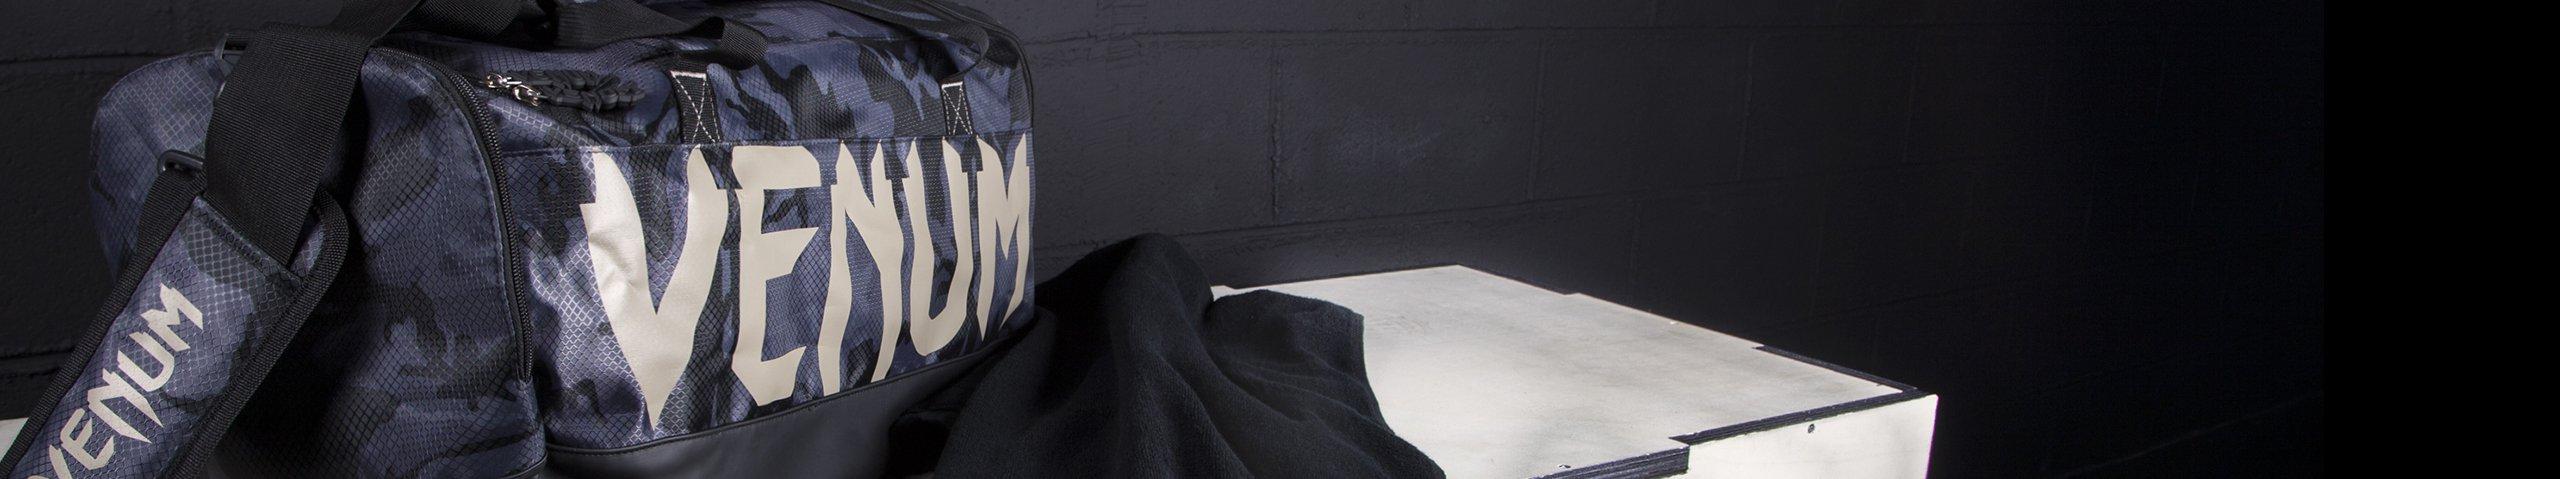 Bagagerie : sacs de sport, sacs à dos & sacs convertibles | Dragon Bleu